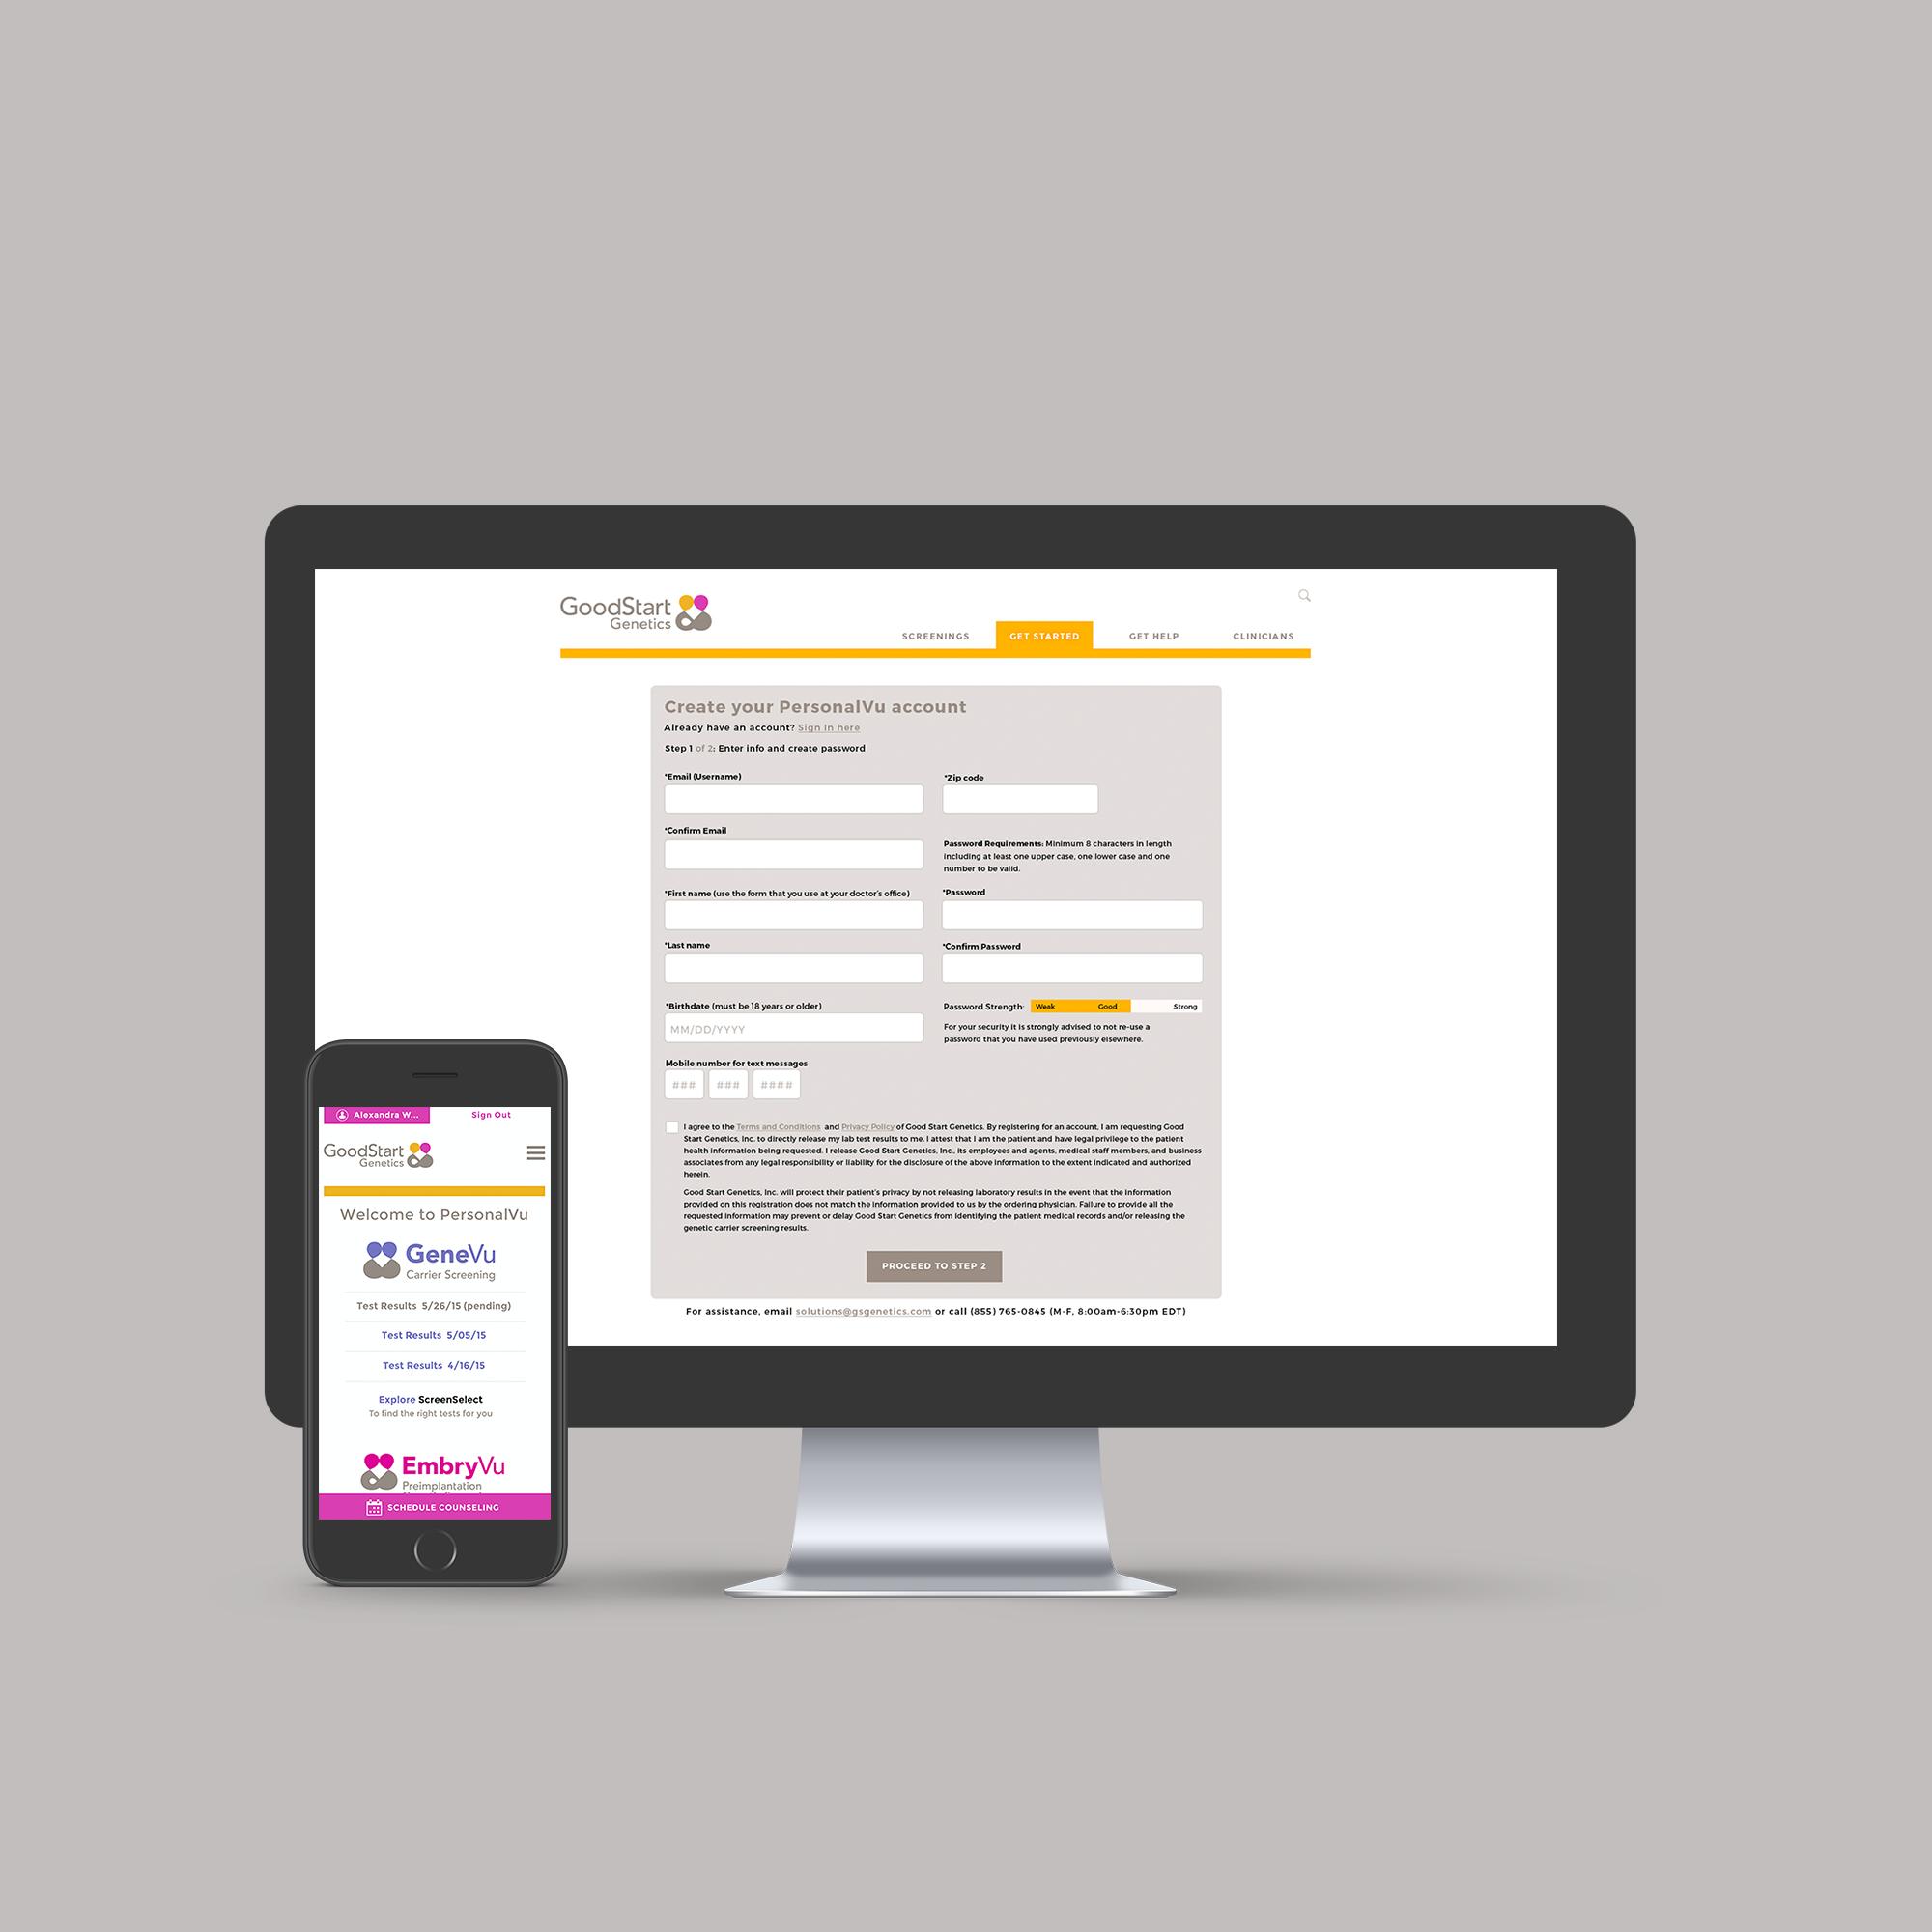 Web Application: GoodStart Genetics